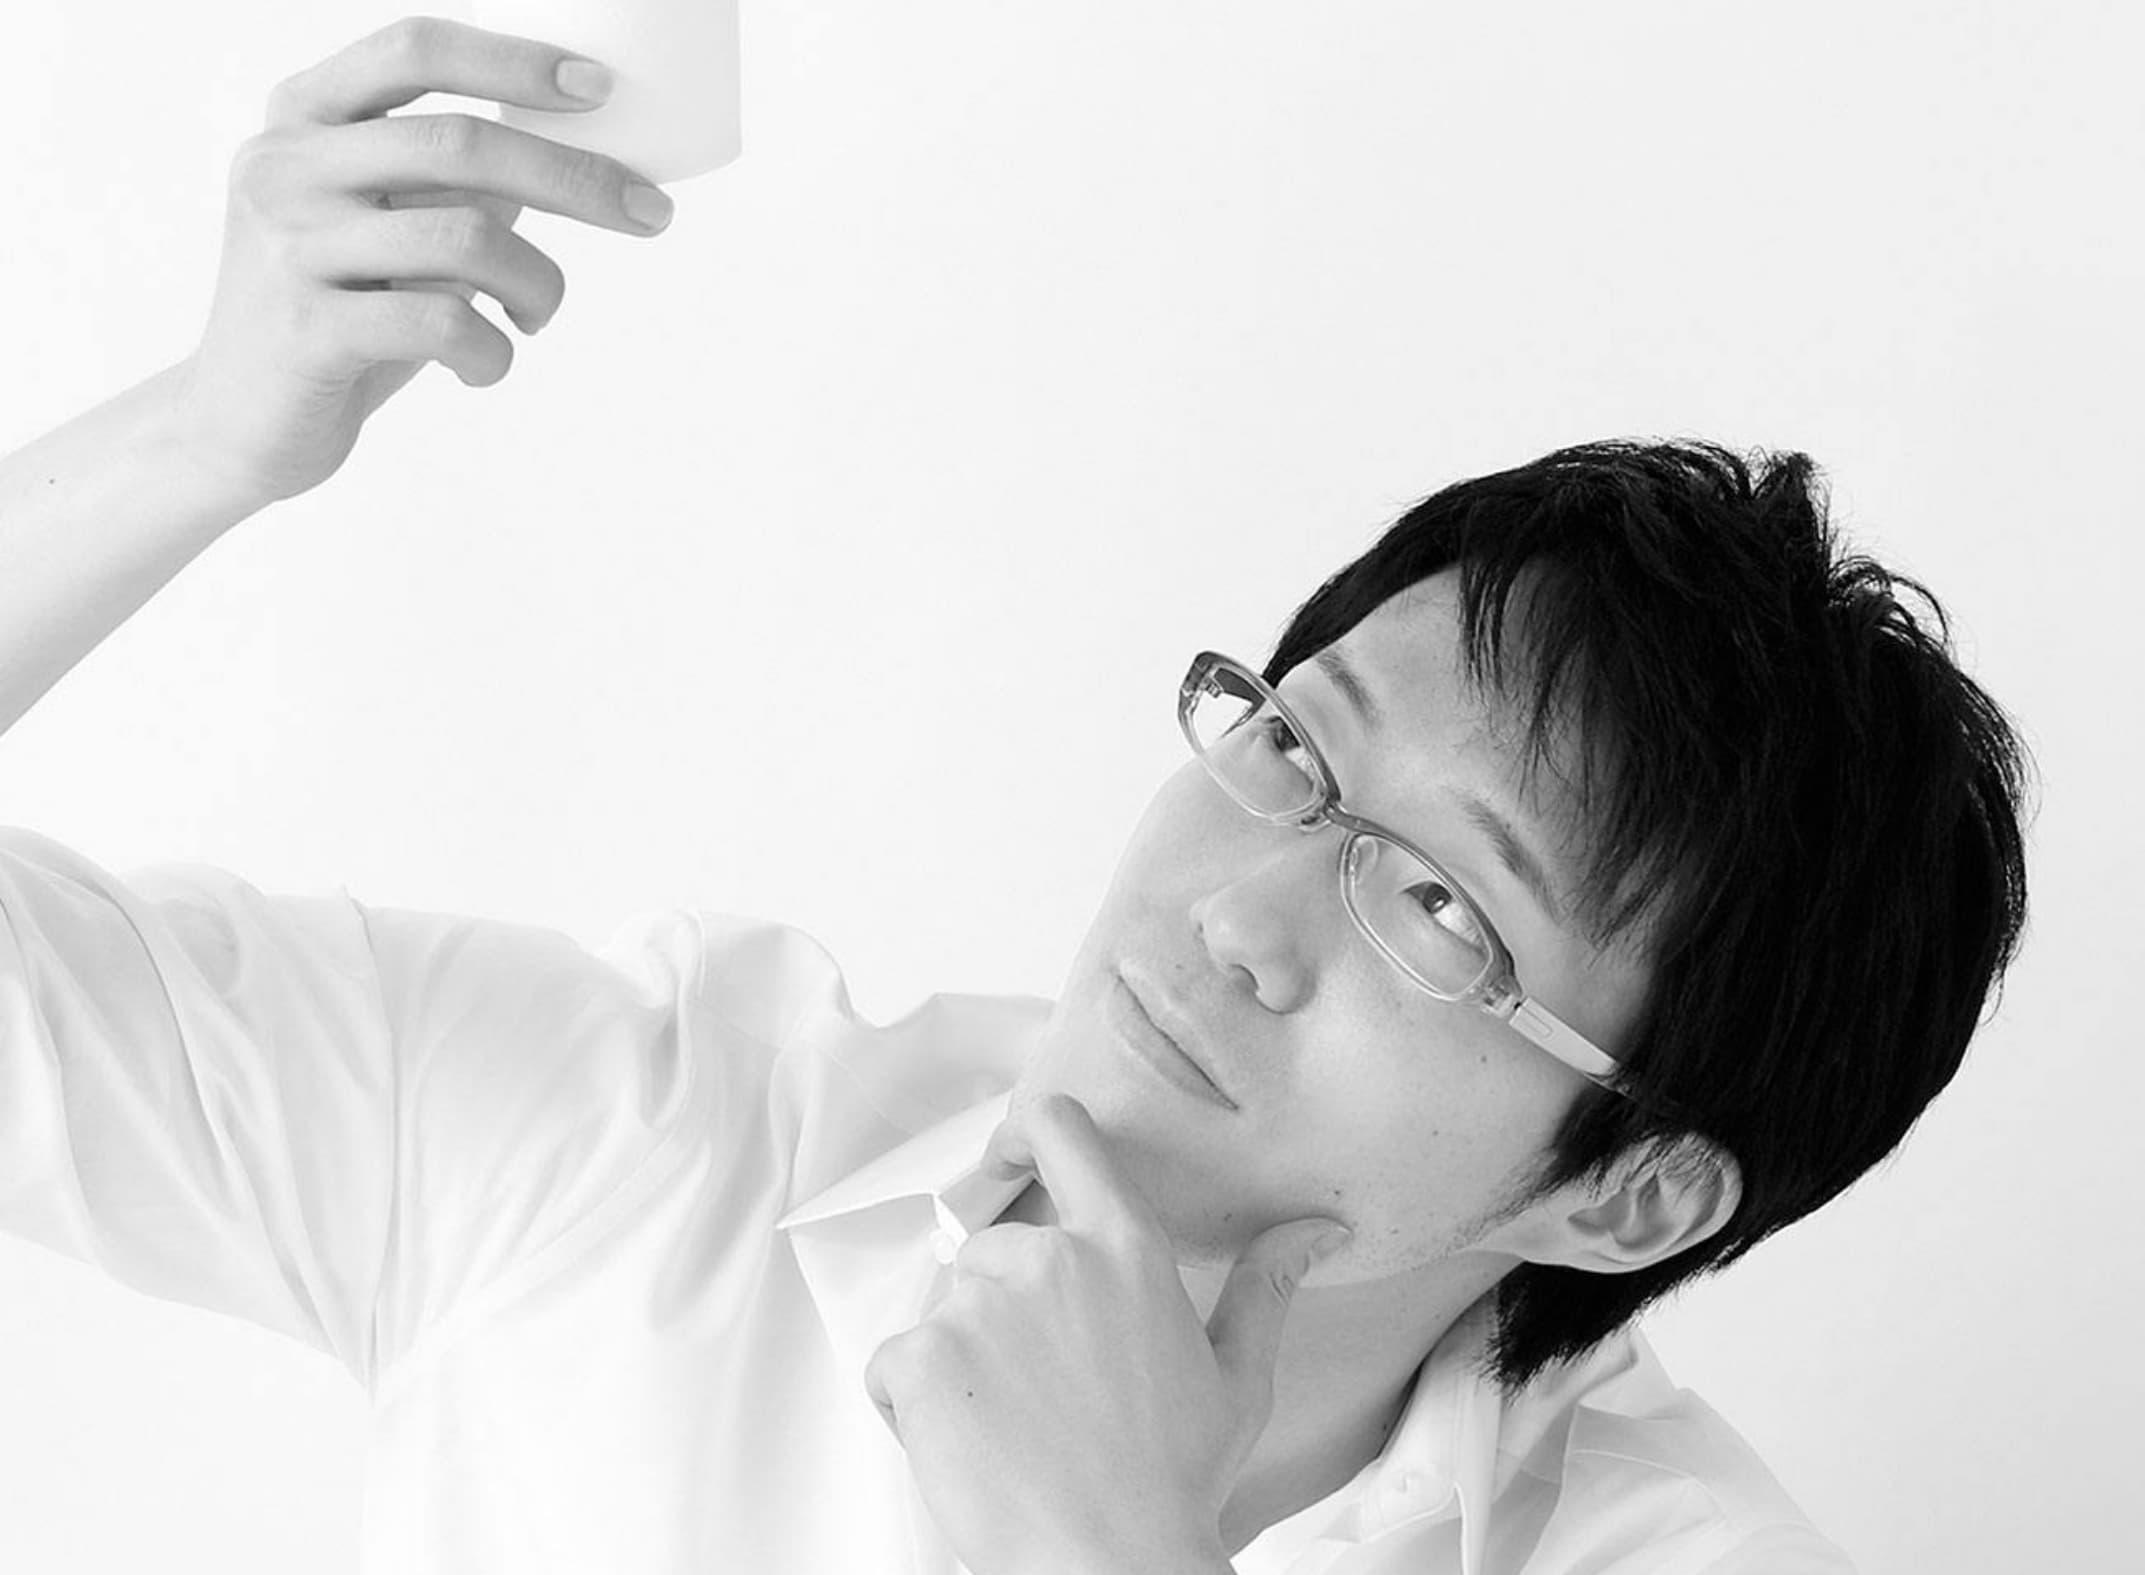 Oki Sato from Nendo design studio, BoConcept Furniture Designer